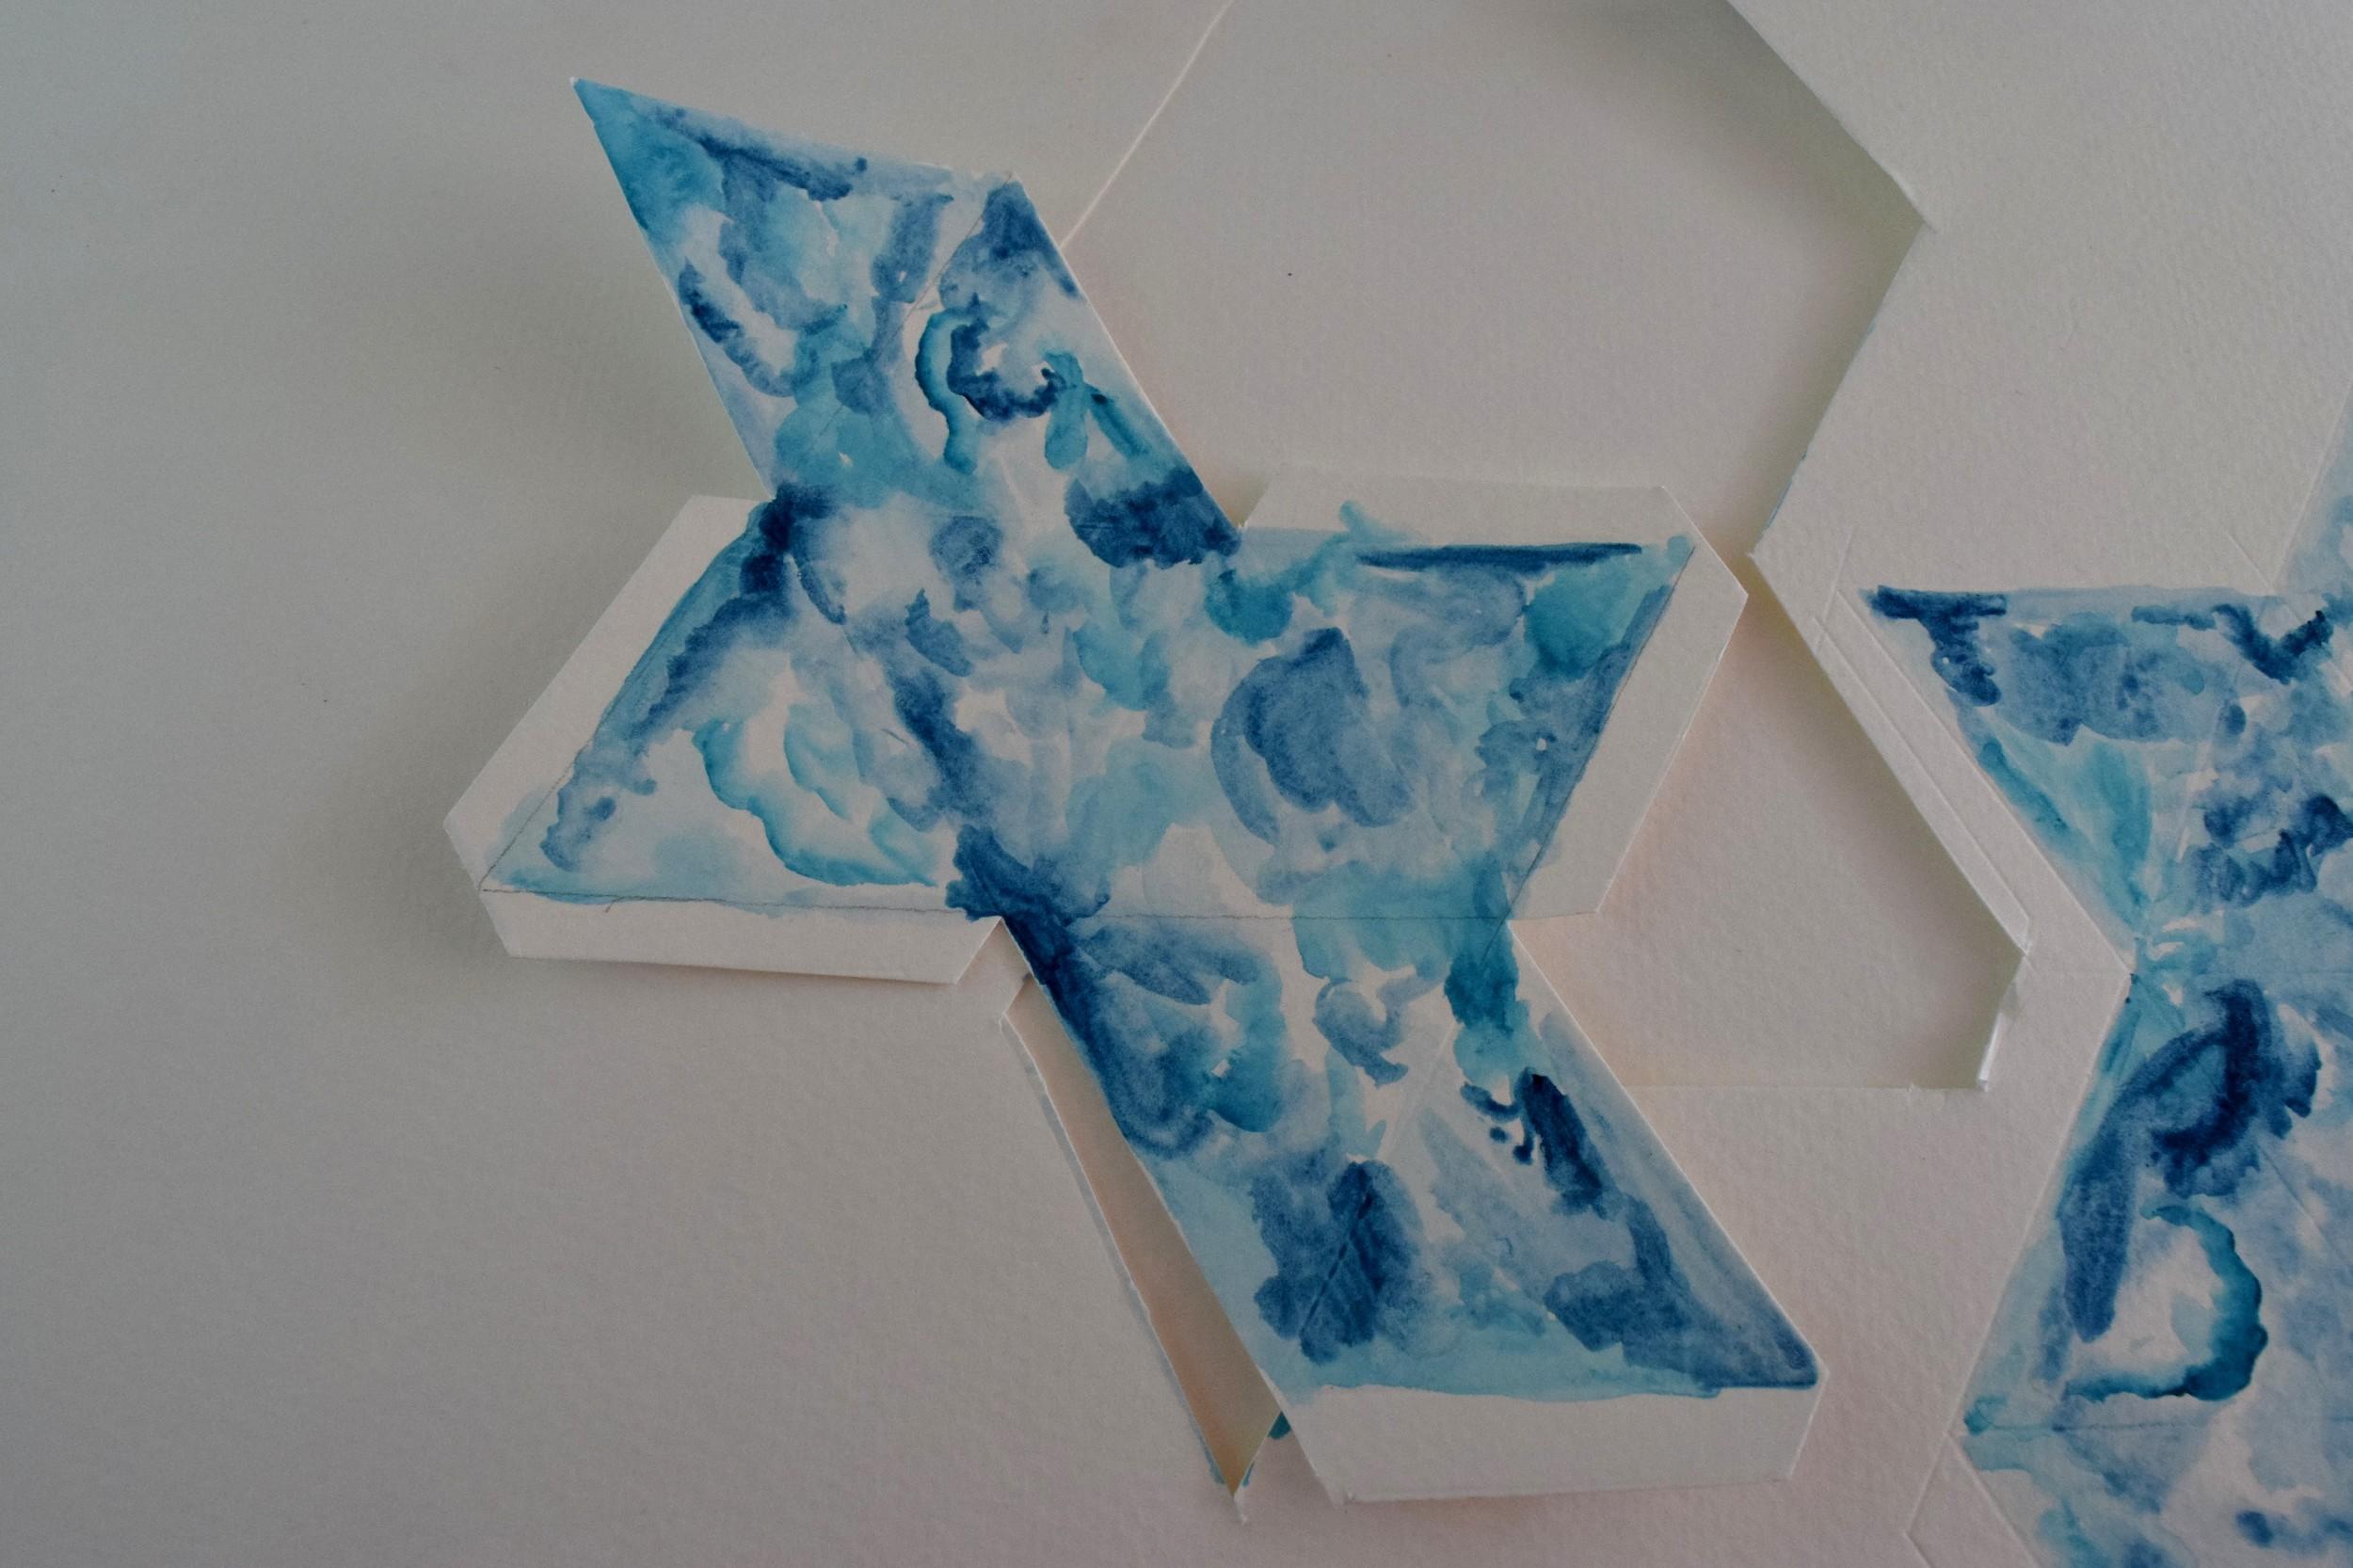 cut your geometric shape